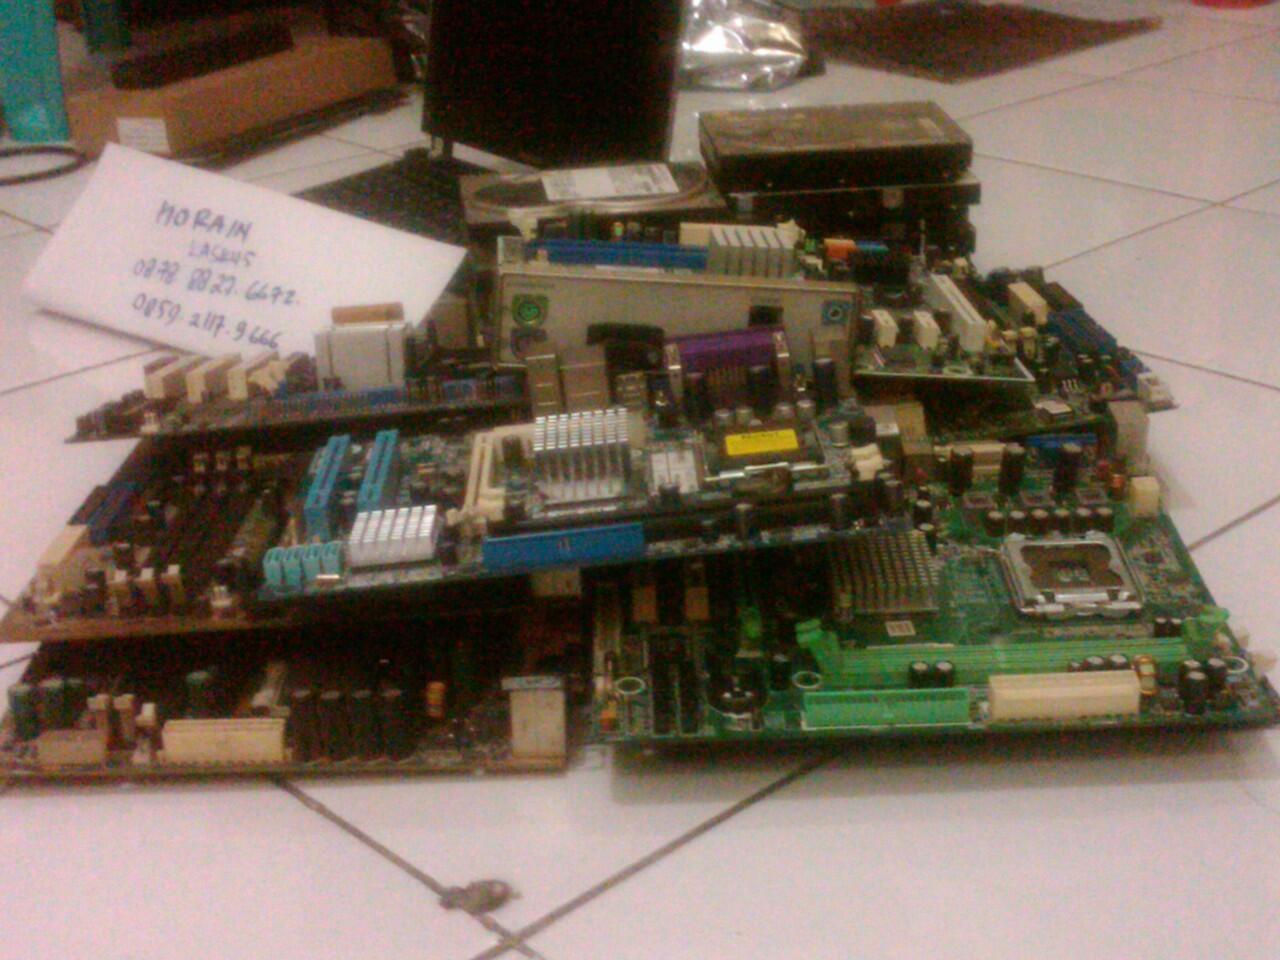 Jual Barang Rusak - Mainboard, HDD, Laptop